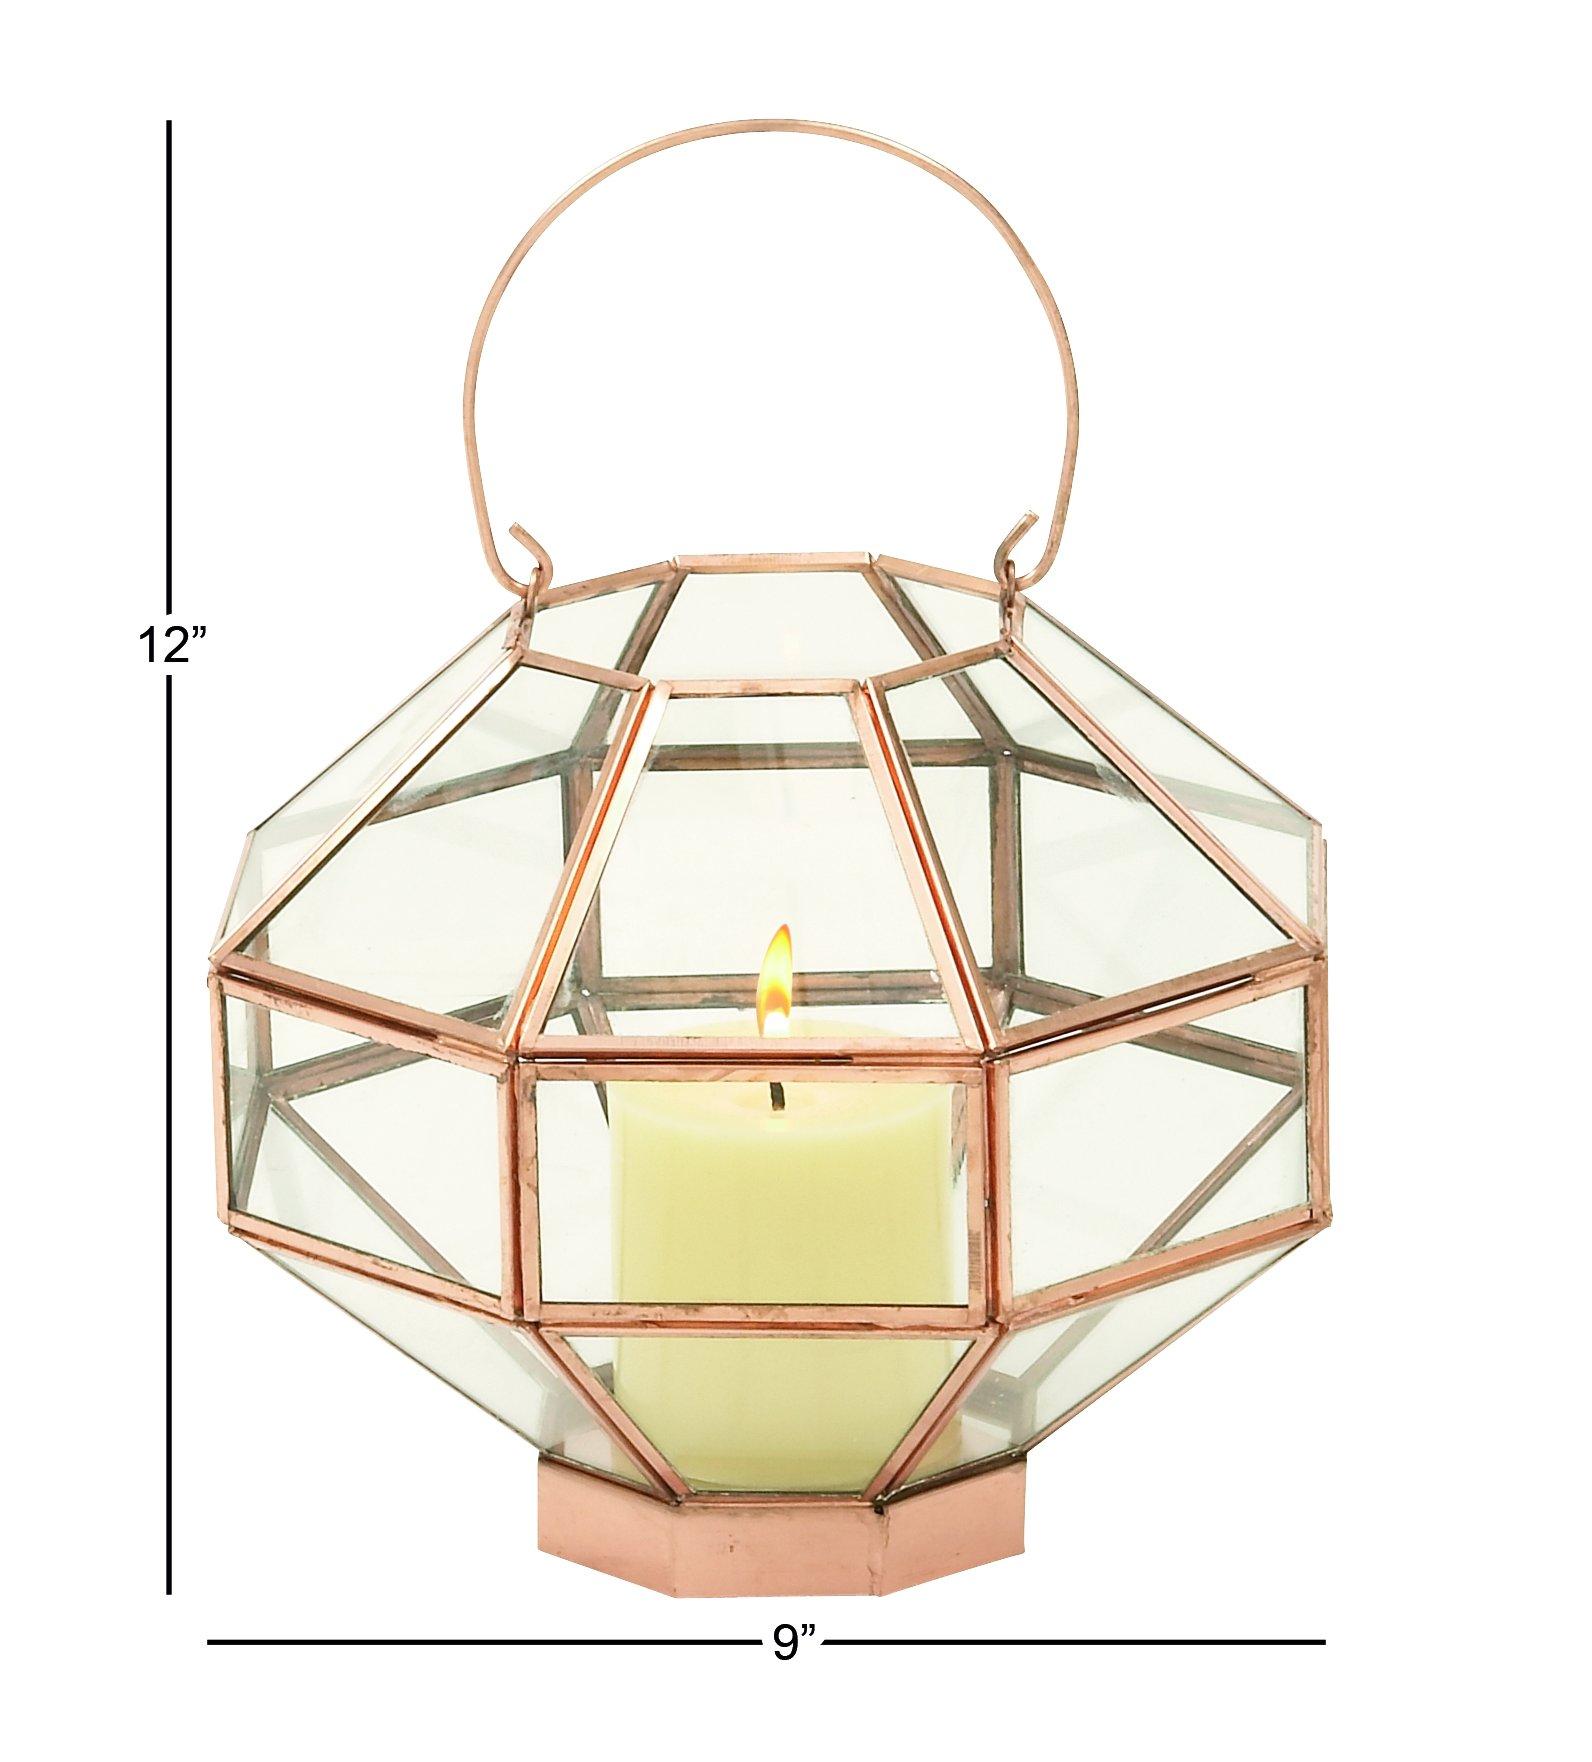 Metal Glass Mirror Cpr Lantern 9''W, 12''H - 37156 by Deco 79 (Image #3)